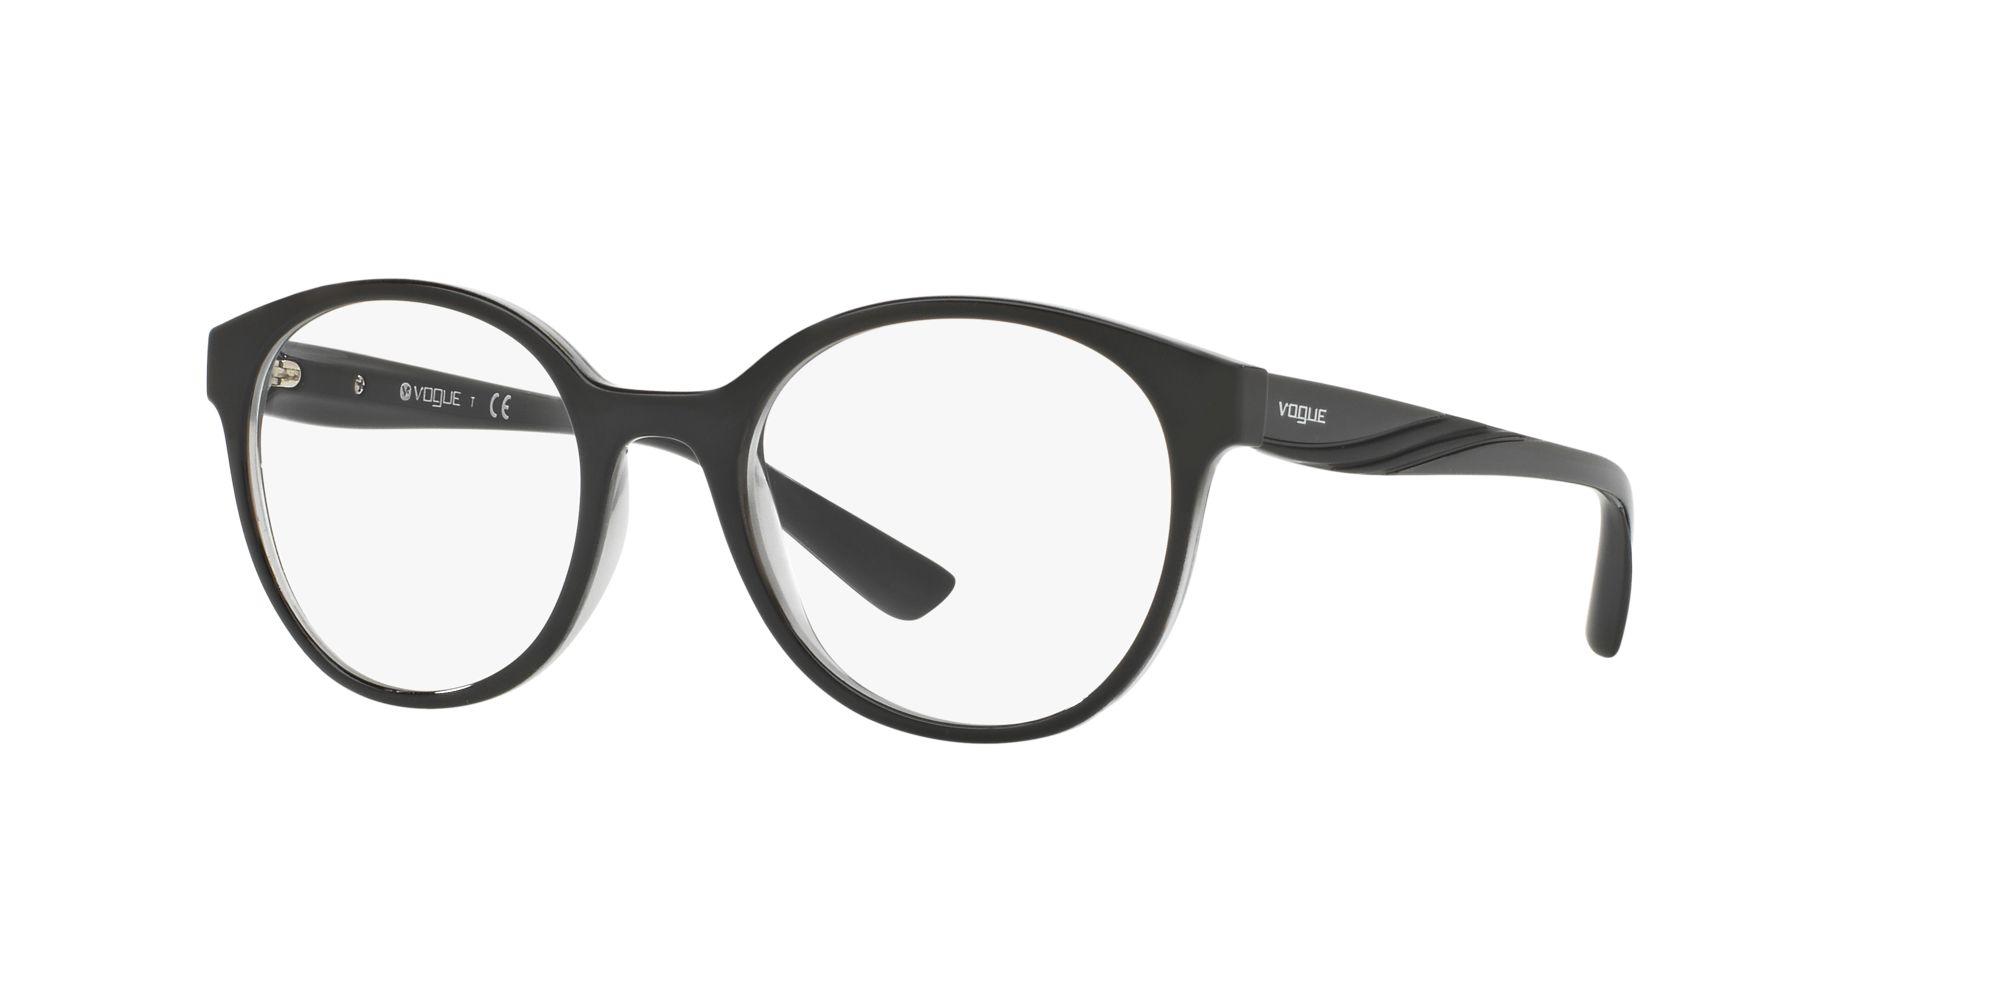 Occhiali da Vista Vogue Eyewear VO5104 Rainbow 2385 G4fL5SJh